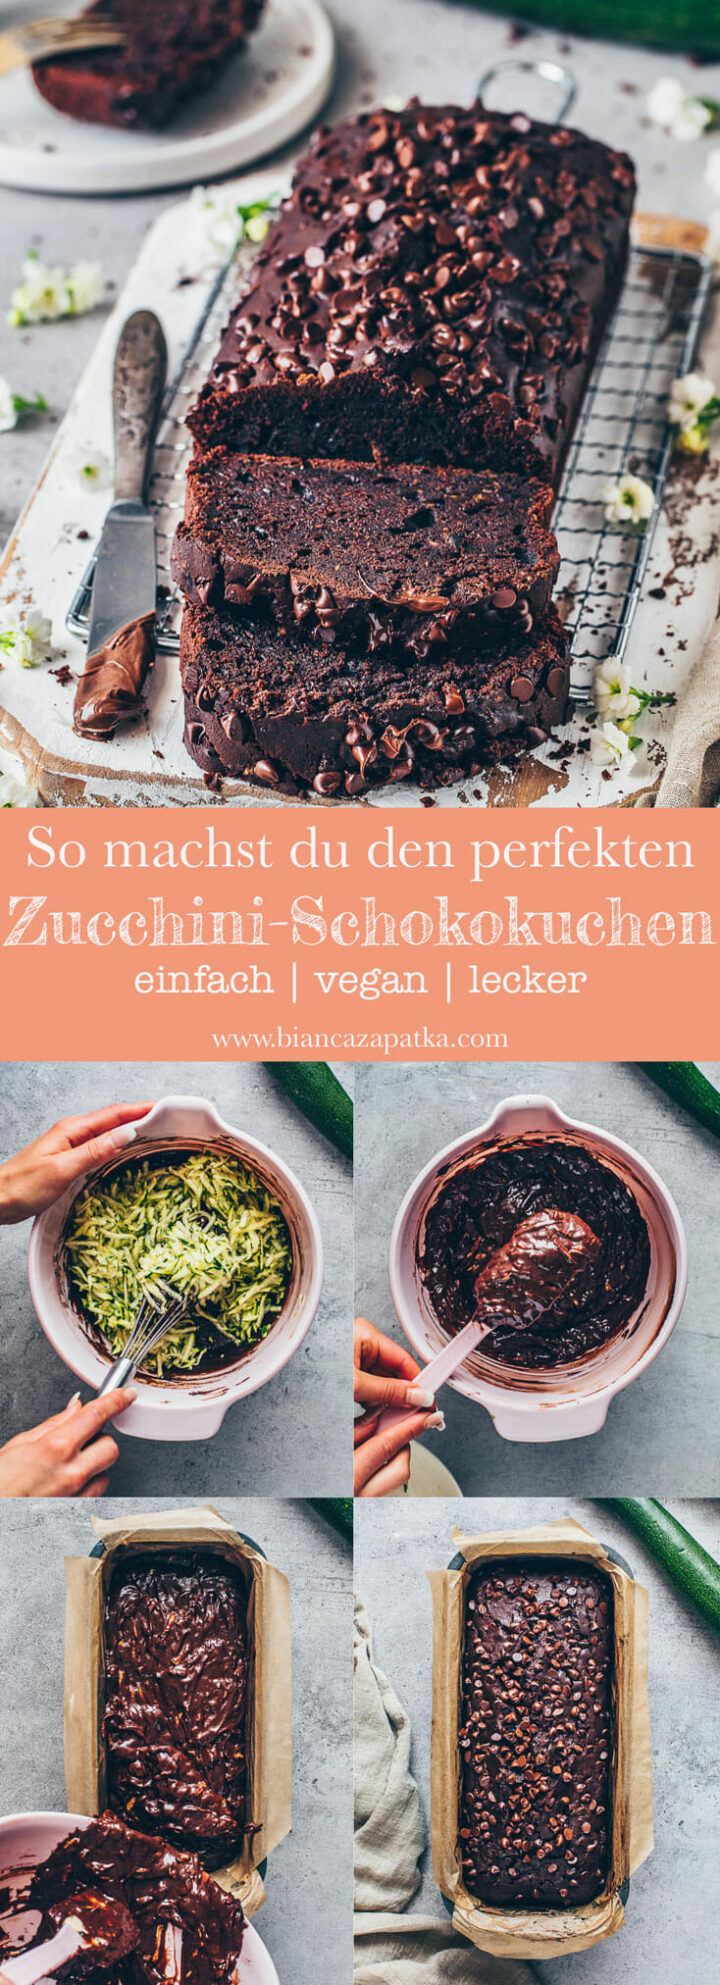 Zucchini Schokoladenkuchen - veganer Schokokuchen